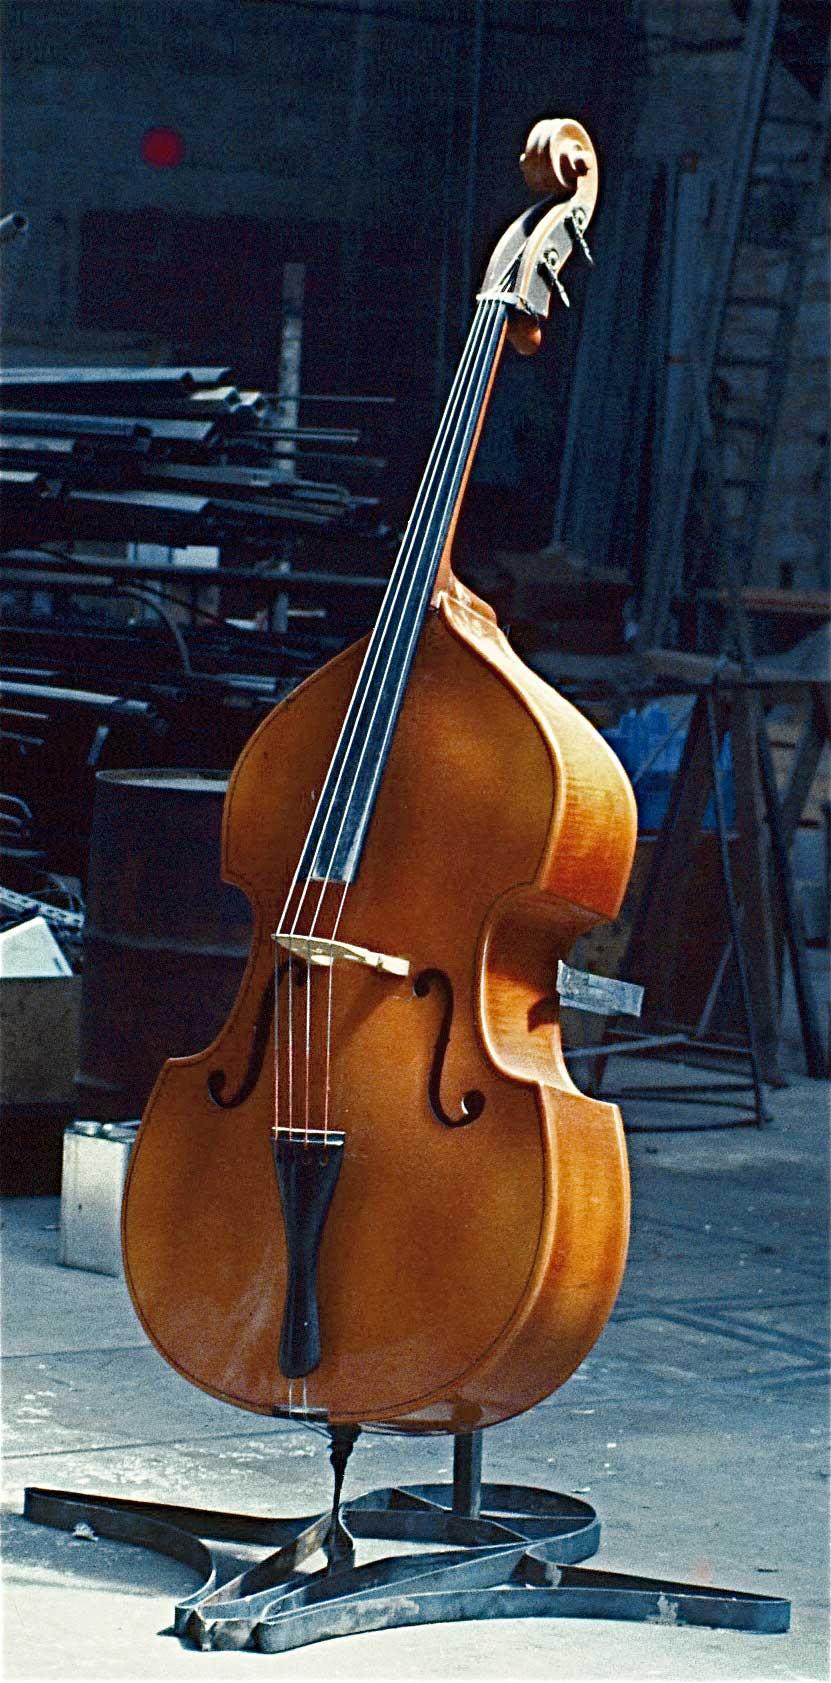 Support-violoncelle-2